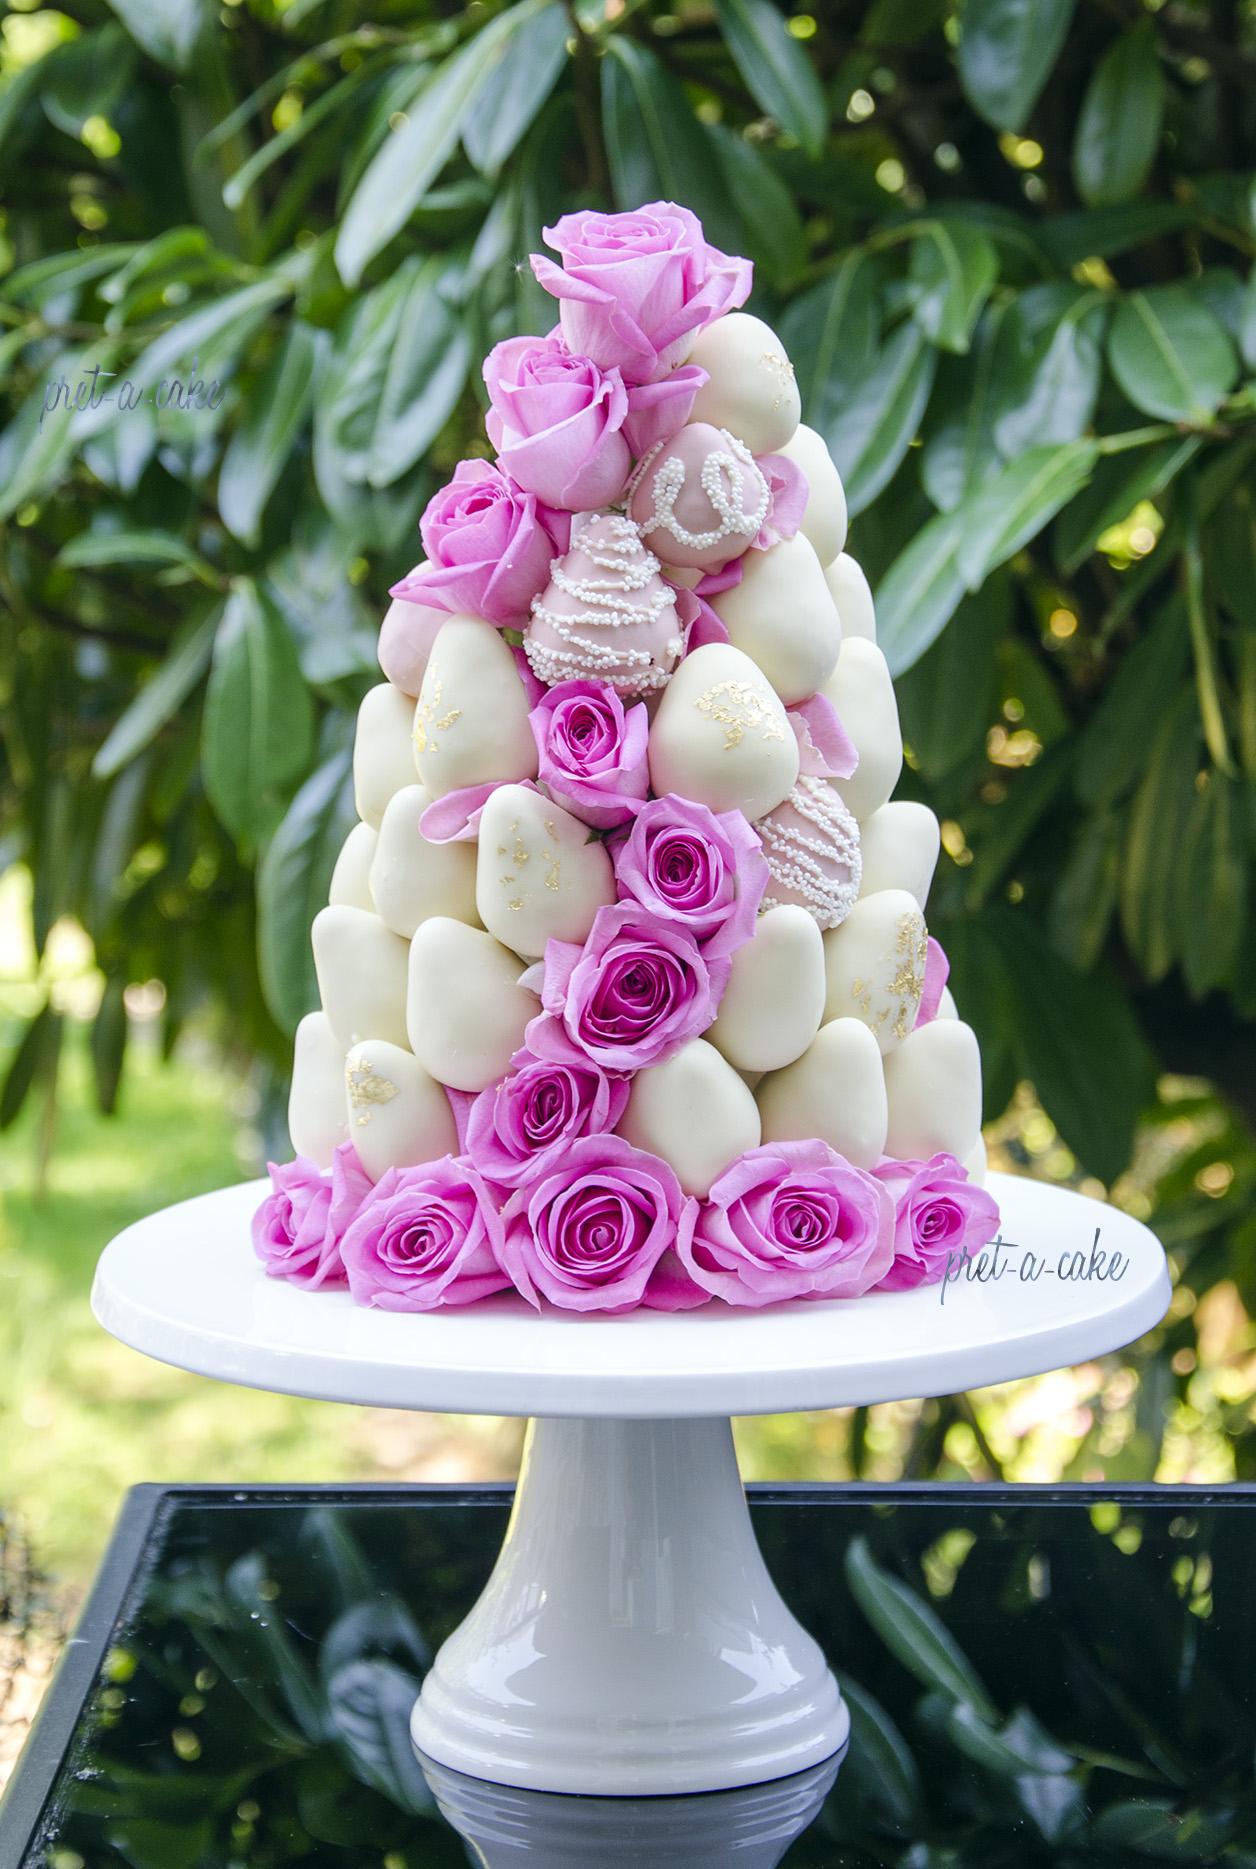 Ultimate Wedding Cake Trends For 2016 & 2017 - WeddingPlanner.co.uk